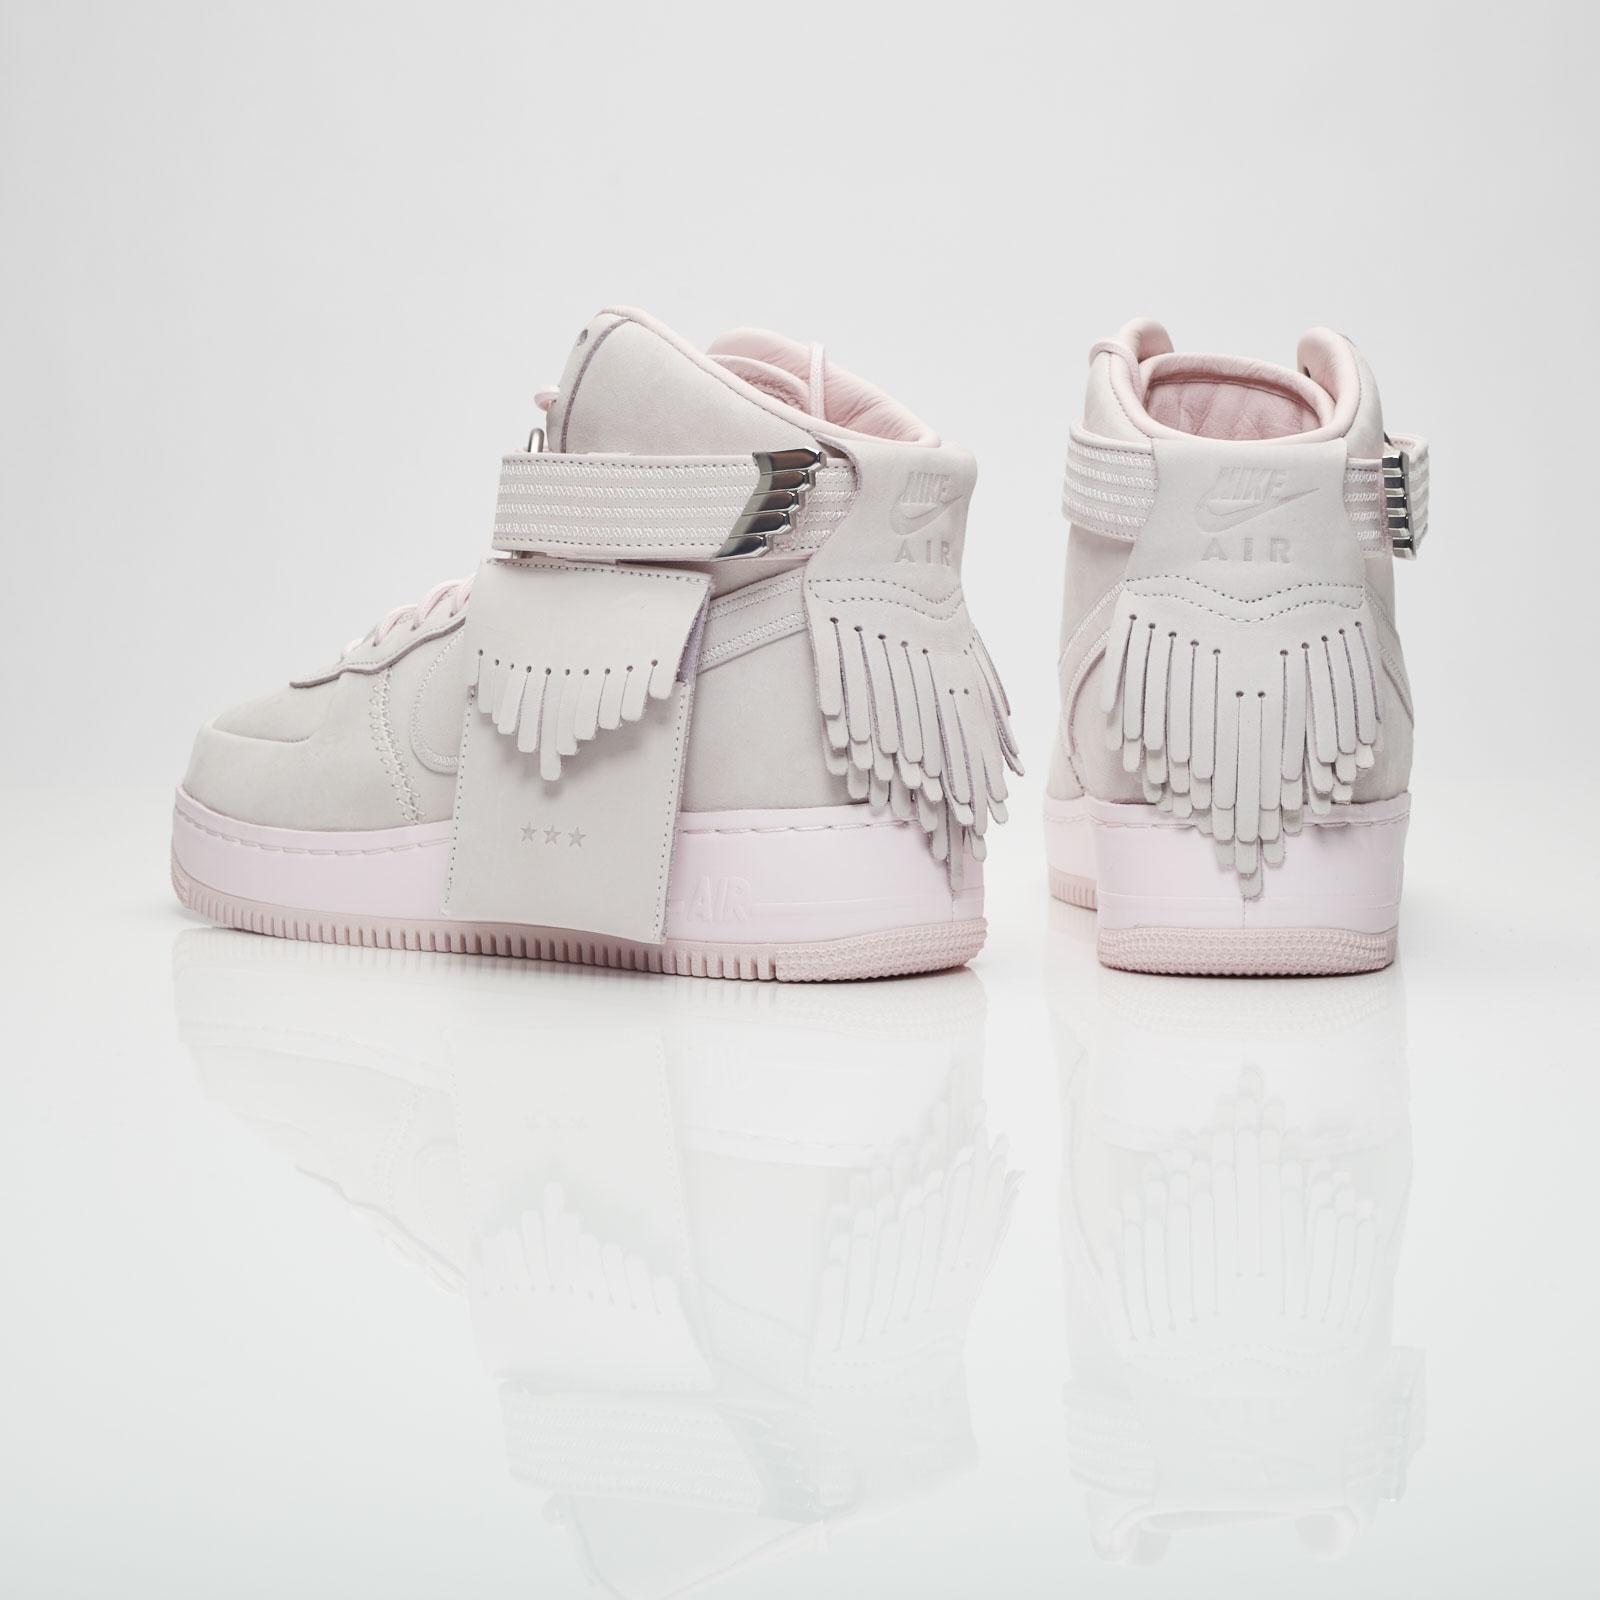 online retailer c8bba 0fde0 ... Nike Sportswear Air Force 1 High SL ...